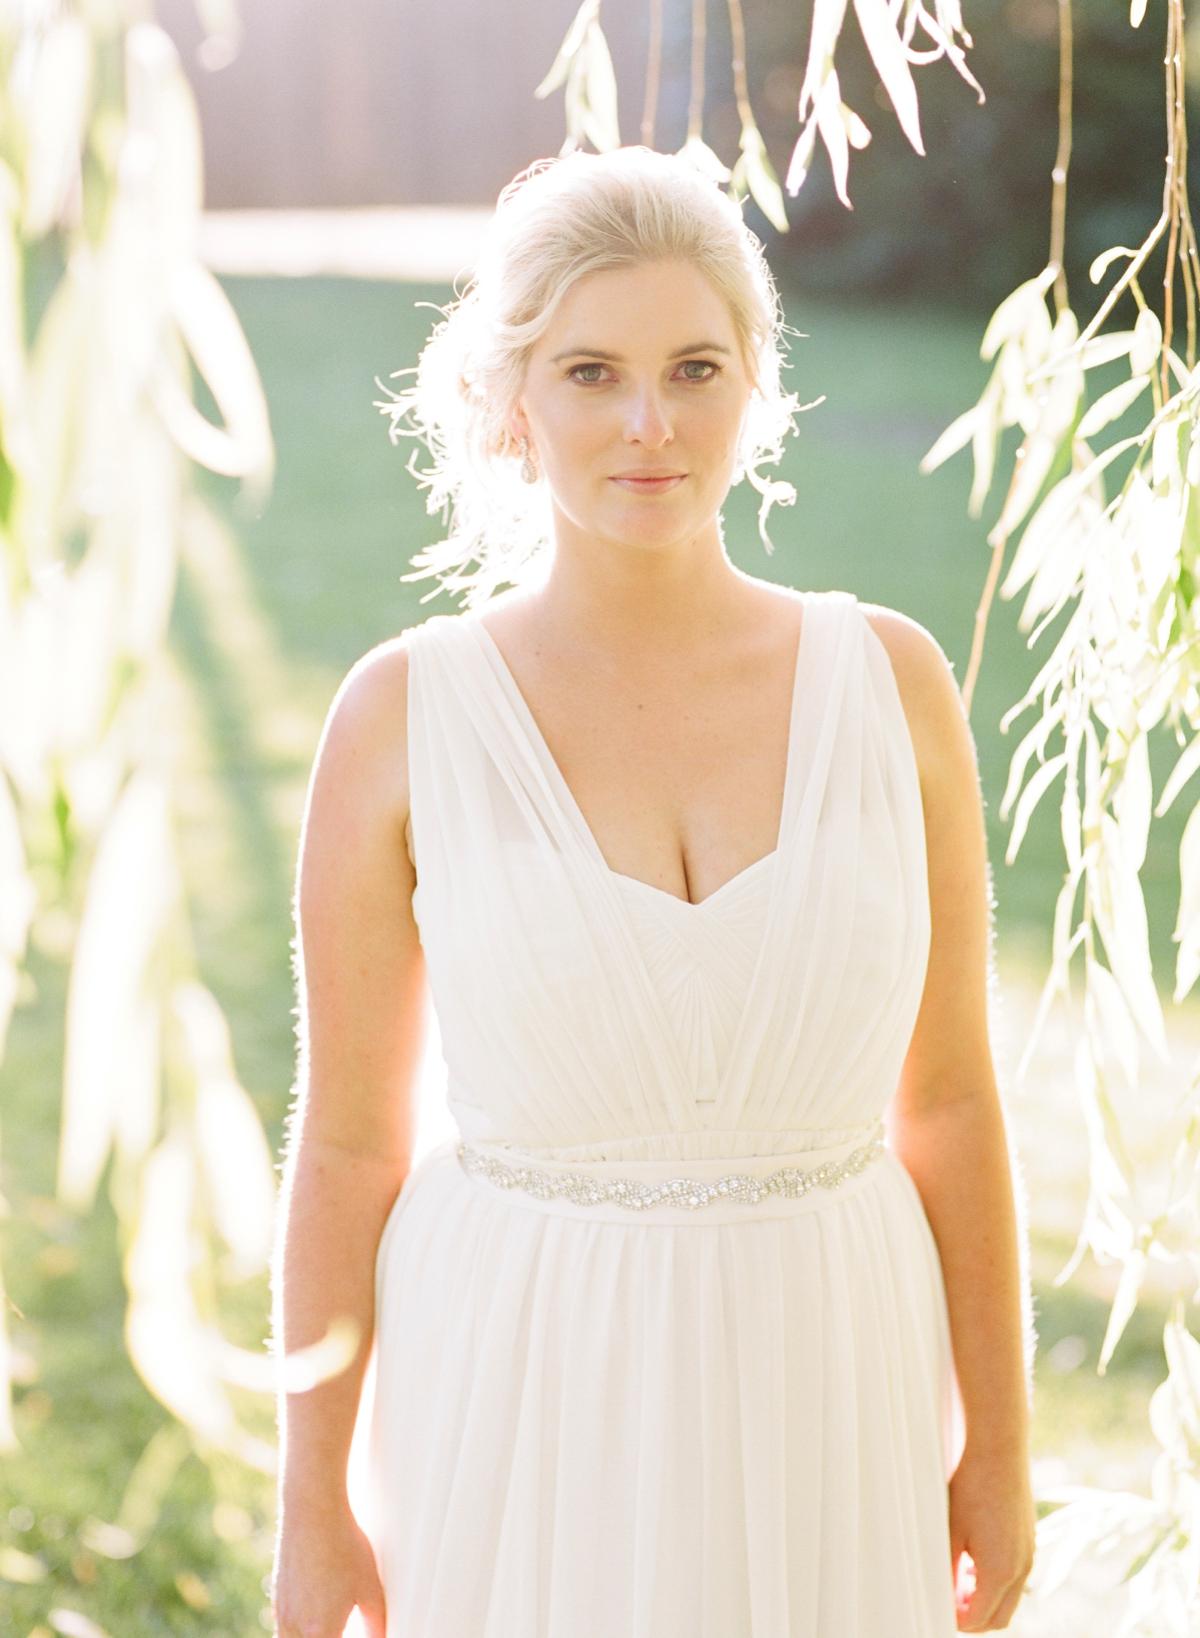 Monterose berry farm wedding by Mr Edwards Photography_0735.jpg